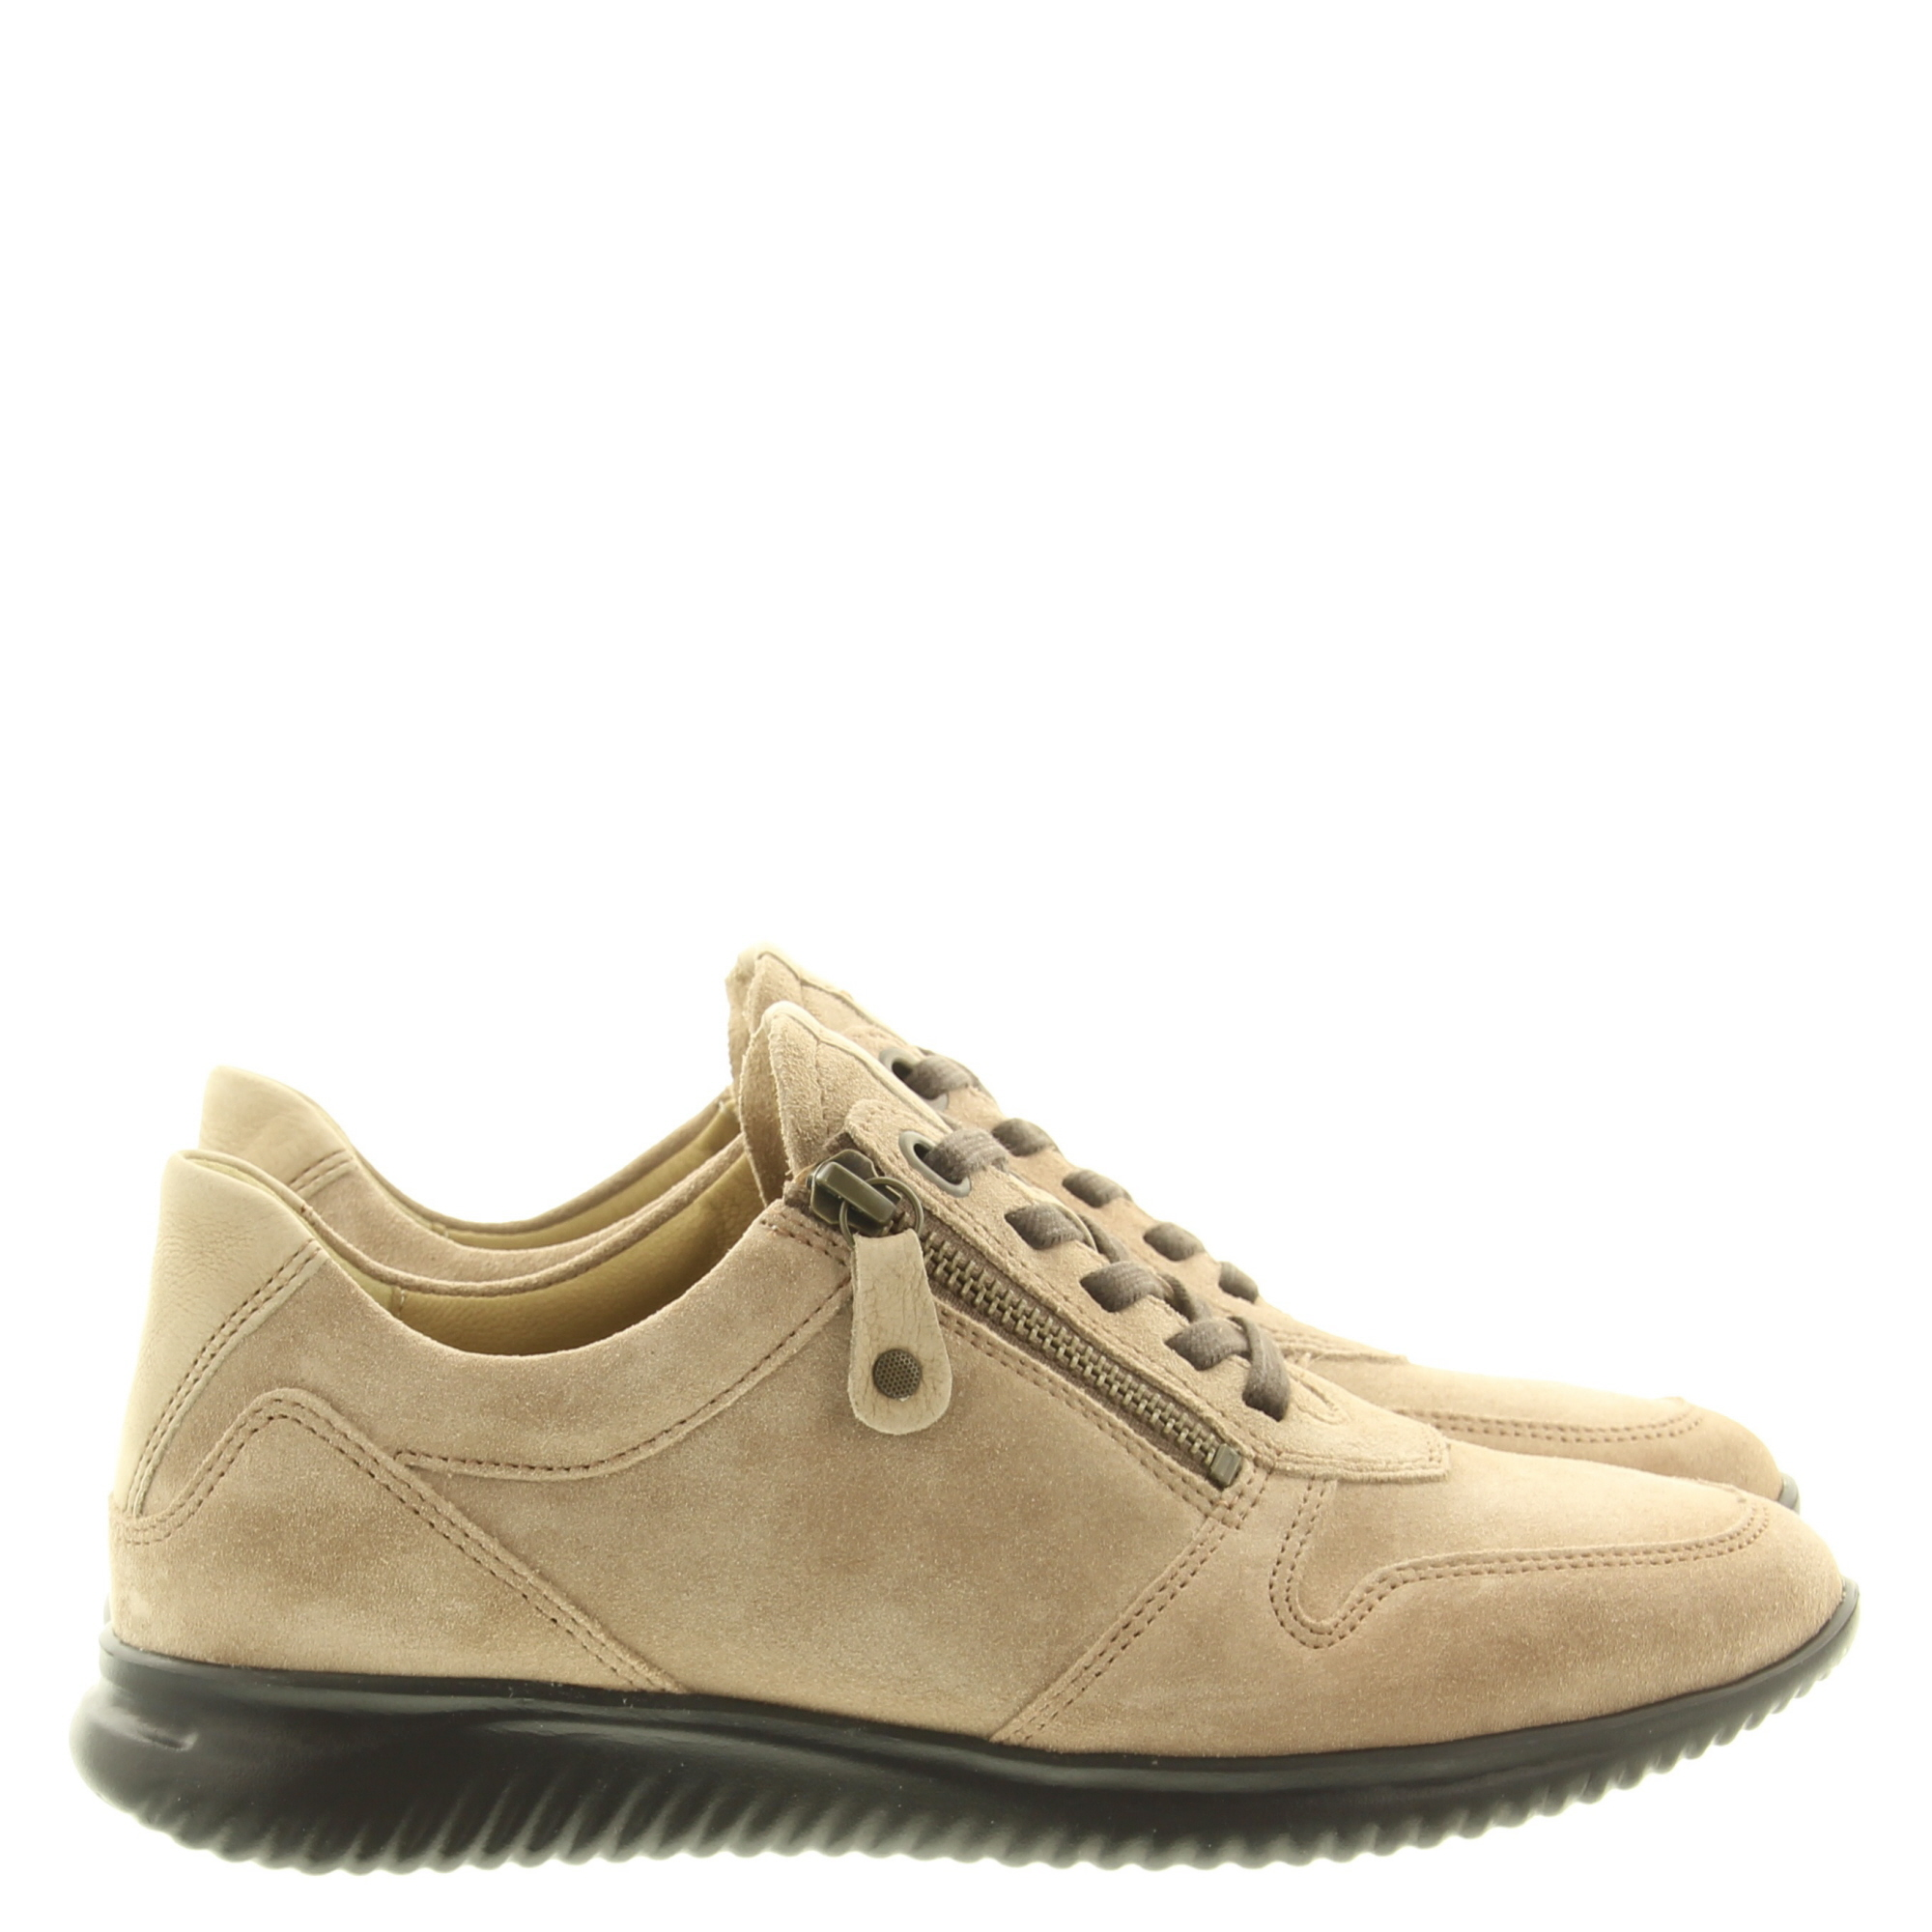 Hartjes 1621136 Breeze Shoe 04.35 Sand-Schlamm